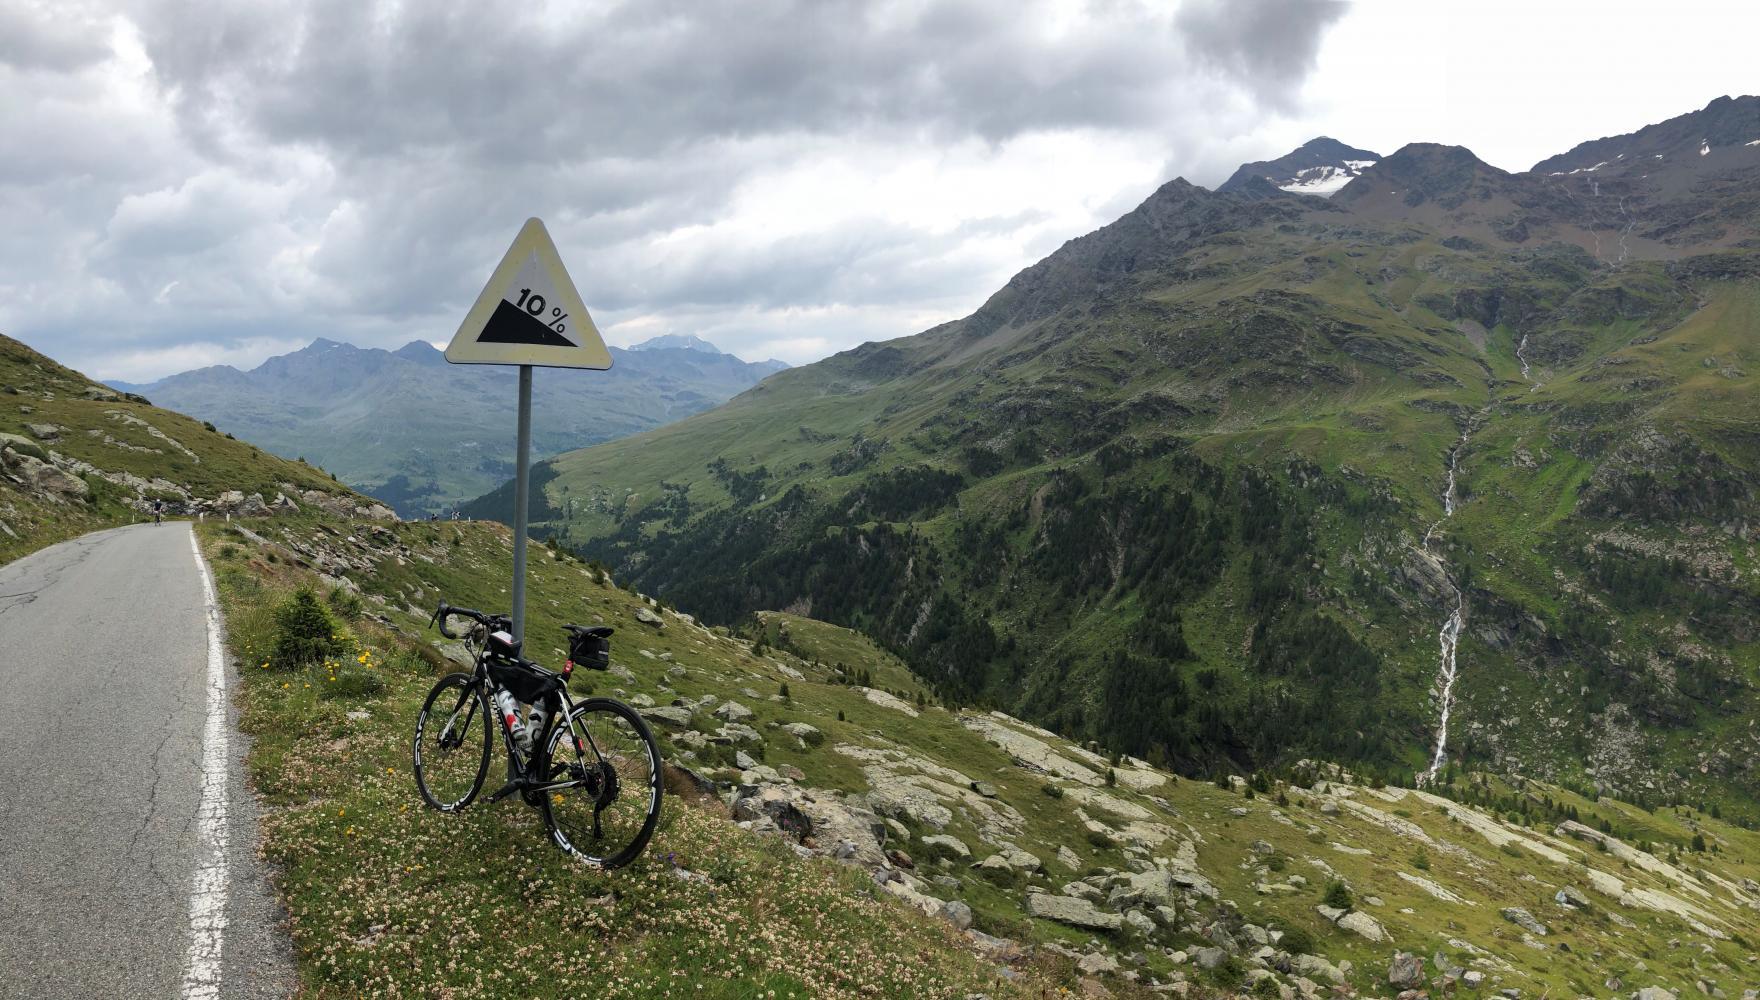 Passo di Gavia (Bormio) Bike Climb - PJAMM Cycling